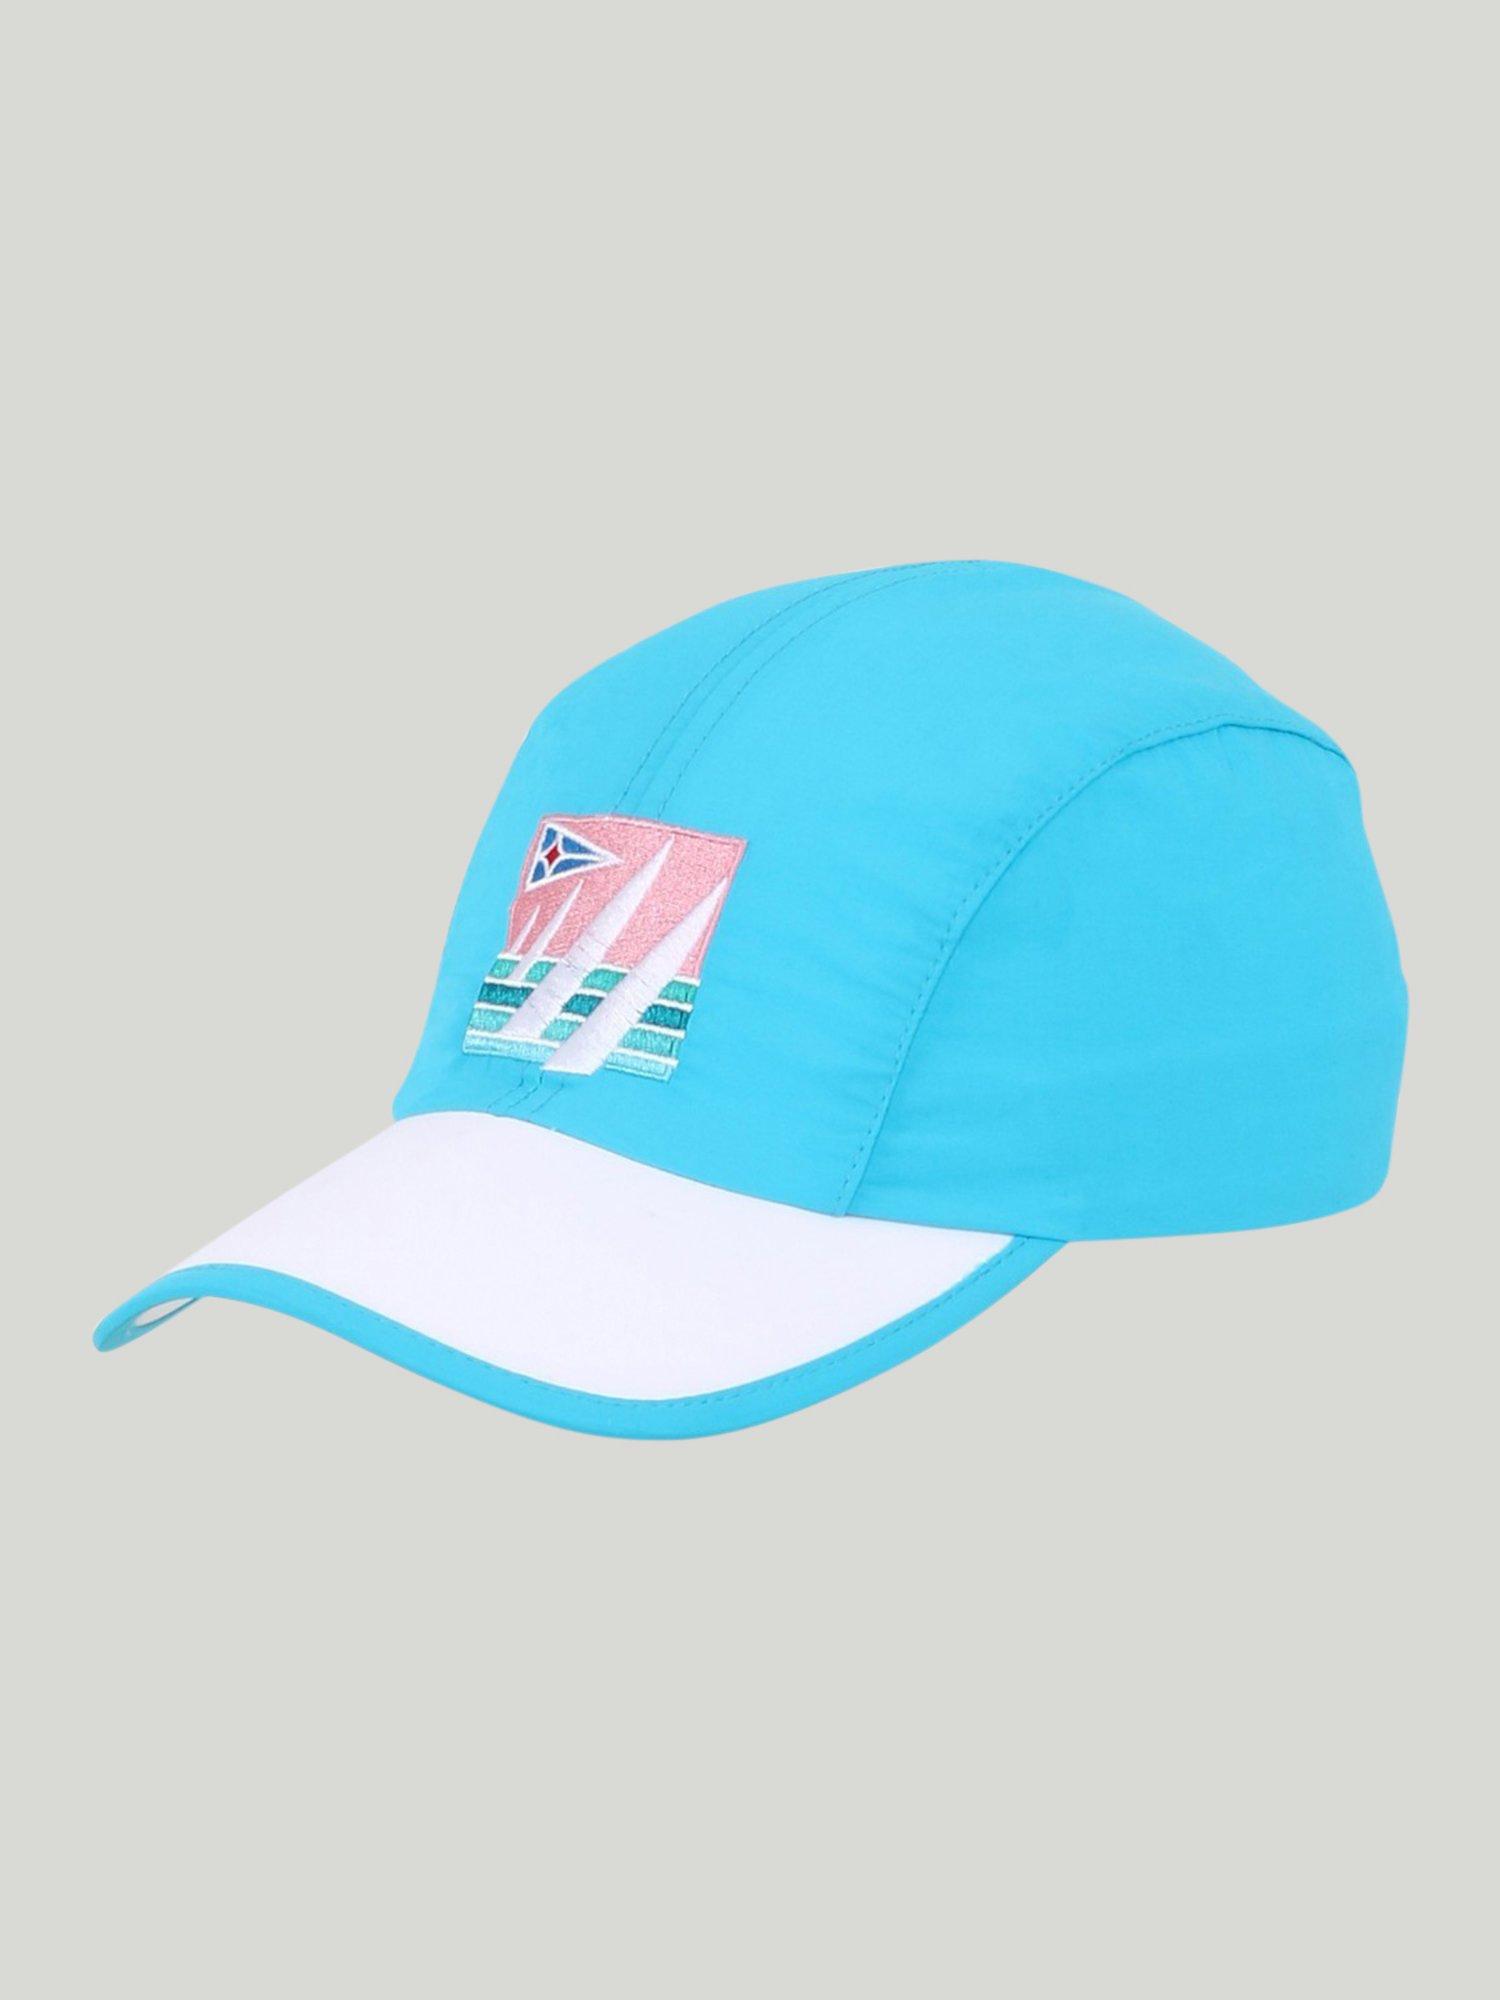 Cap Swan Cup - Caribbean Blue